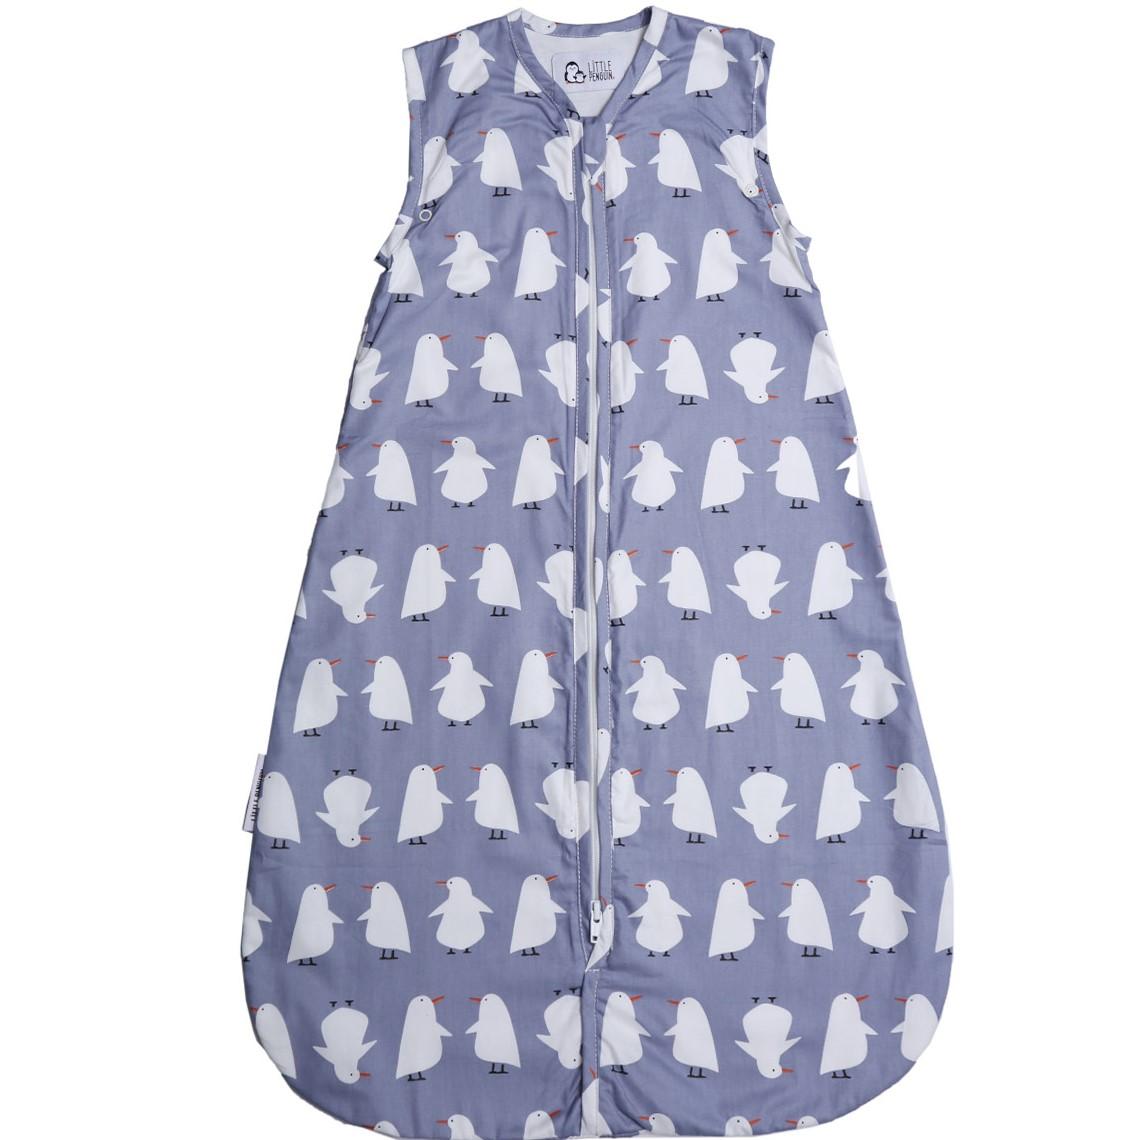 Travel sleeping bag - Penguin chic